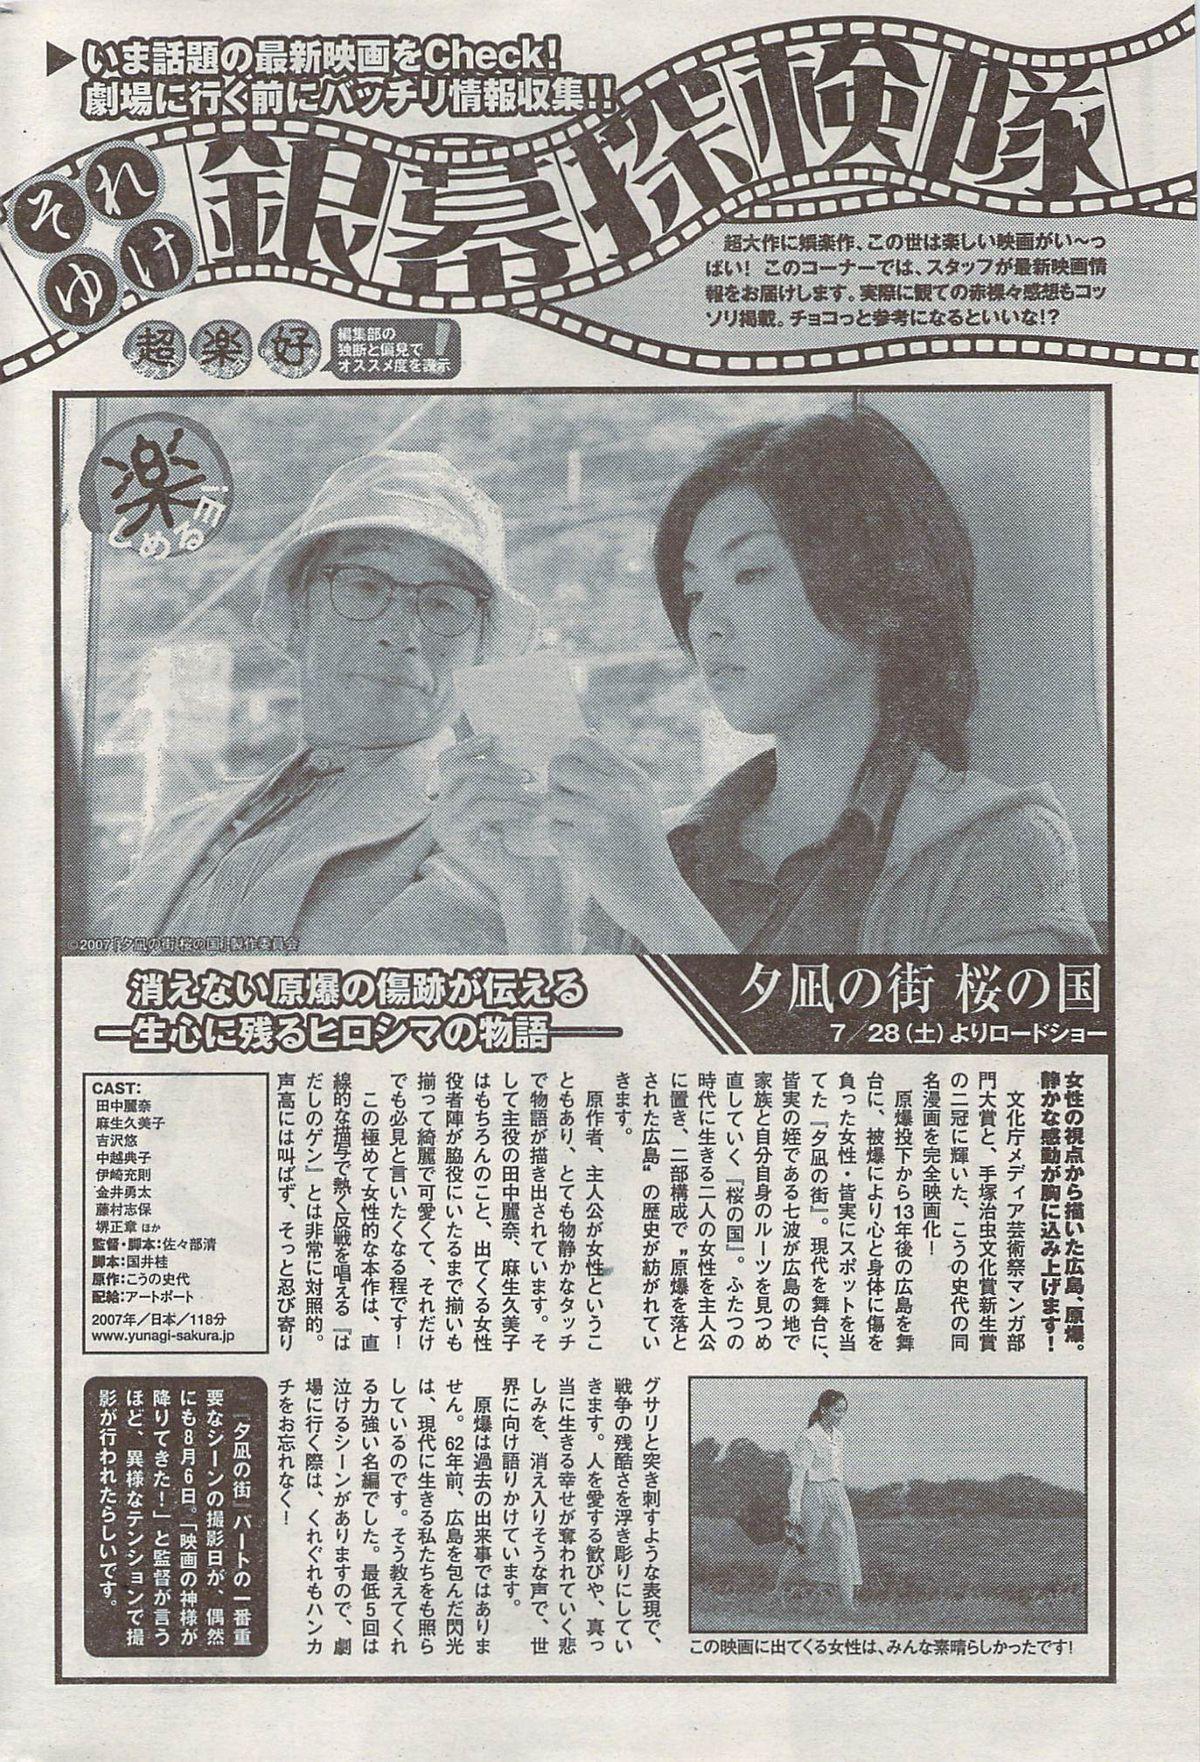 Monthly Vitaman 2007-08 225